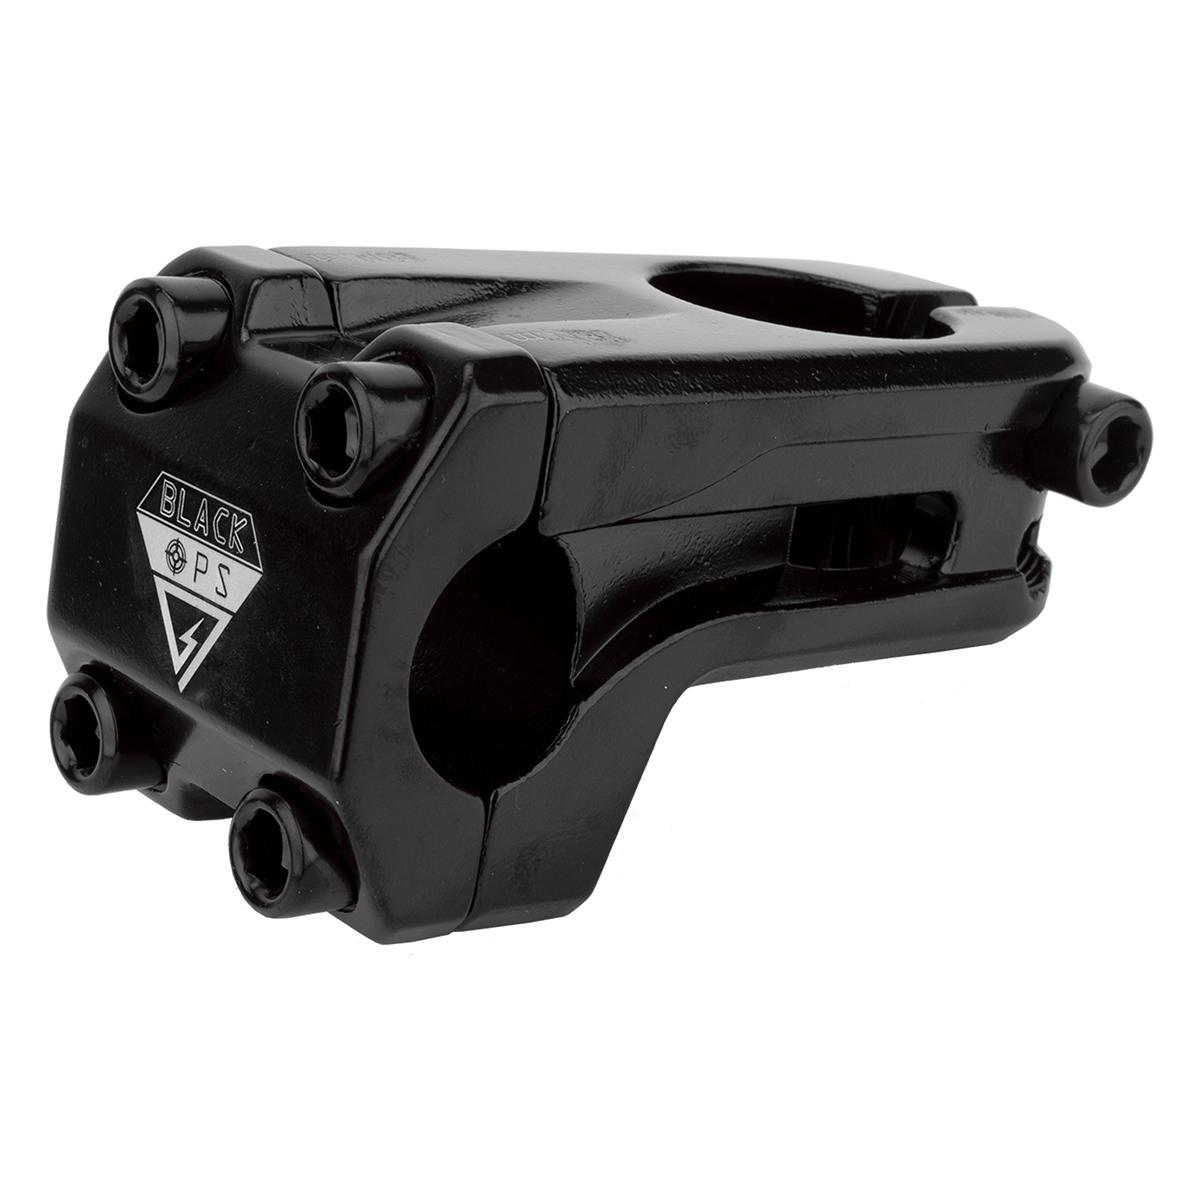 Black Ops Attacco manubrio BMX Ahead 1-1/8 Defend-R Nero